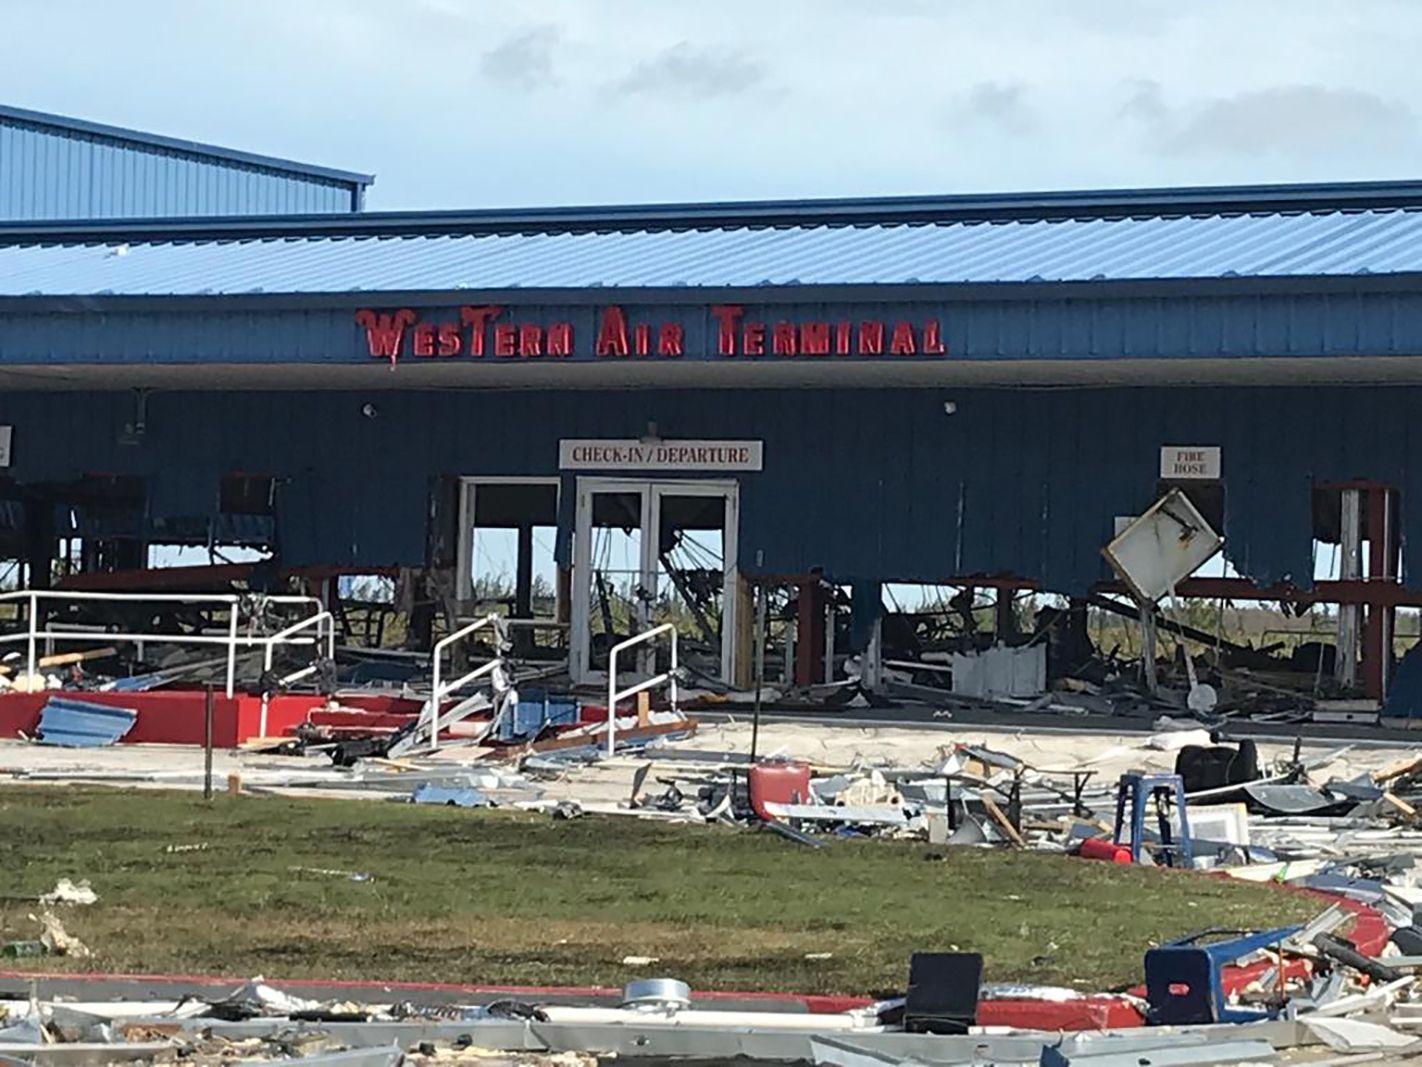 Debris left by Hurricane Dorian litters Grand Bahama International Airport in Freeport